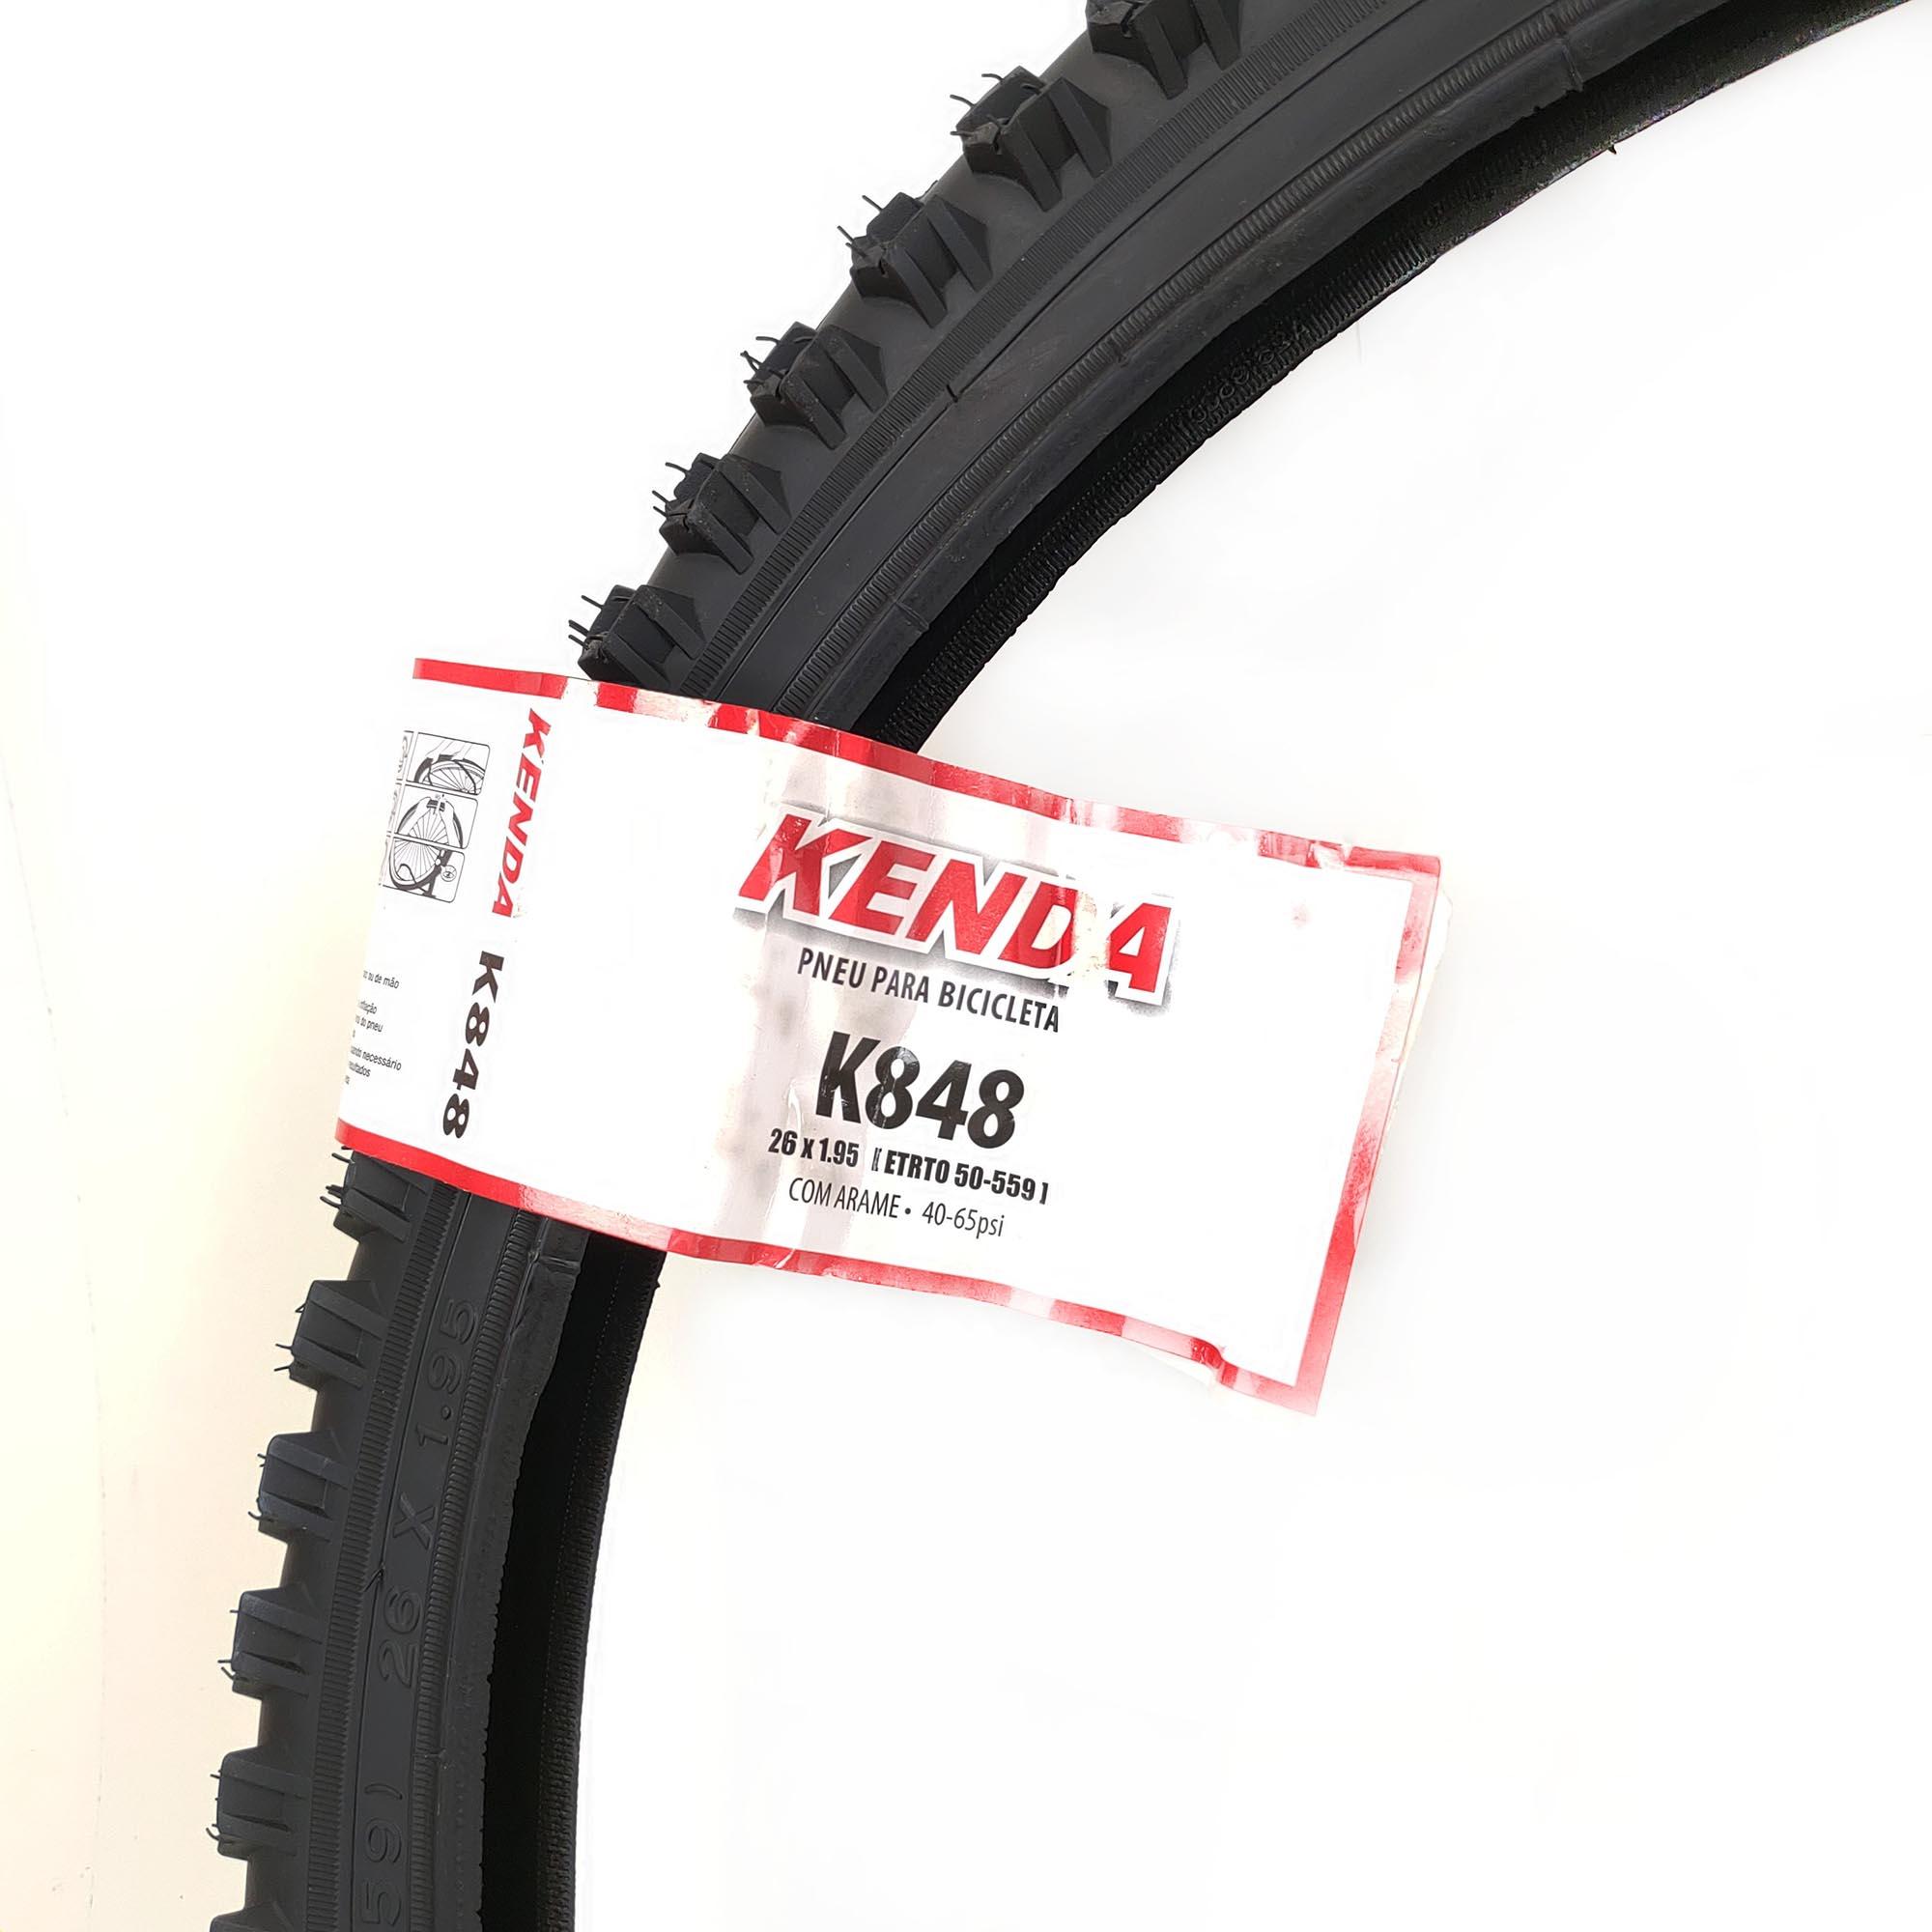 Pneu de Bicicleta Aro 26 Kenda 1.95 Mtb K848